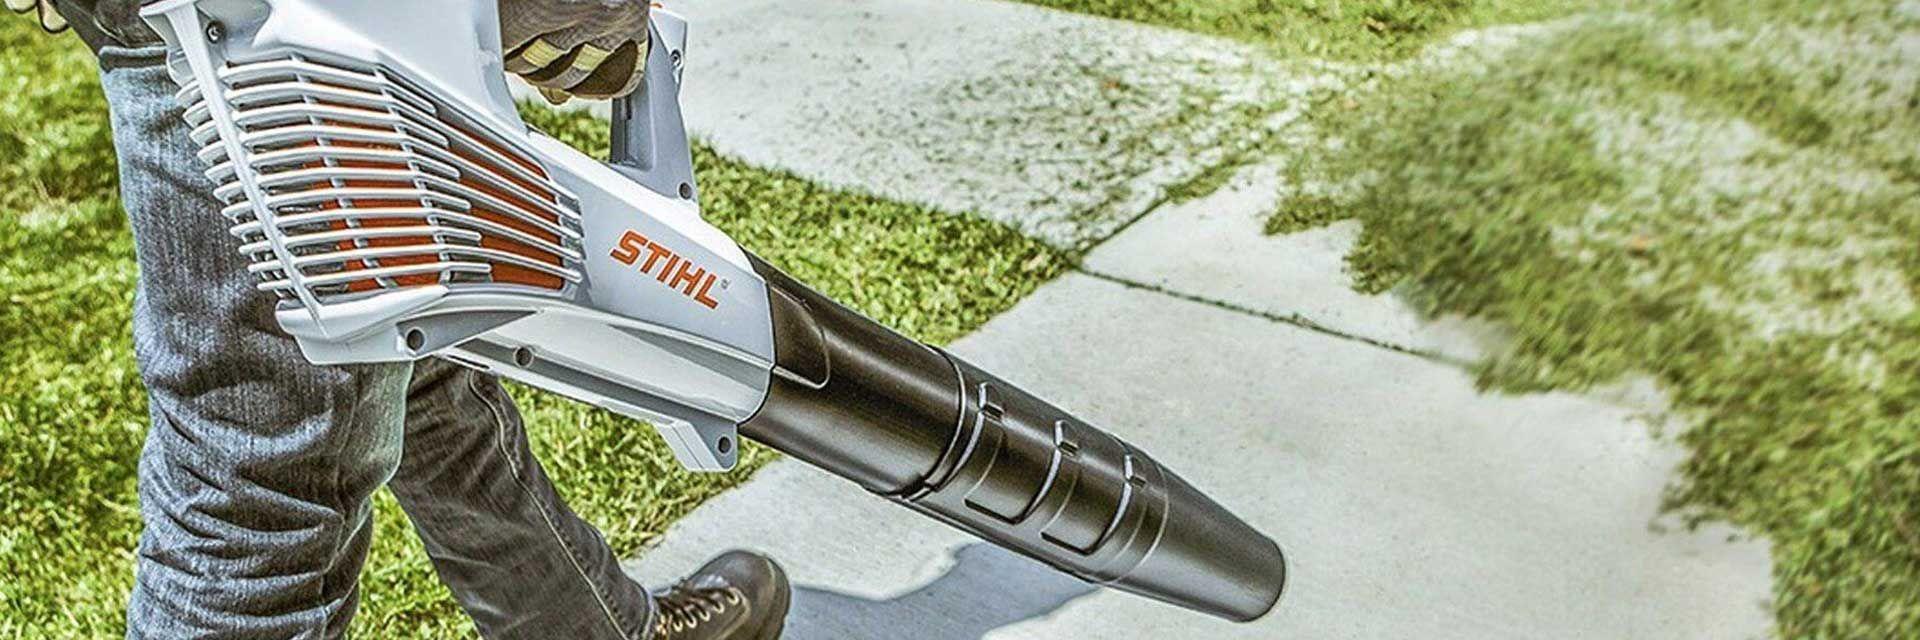 Motorsports Vehicles, Power Equipment, & Lawn Equipment